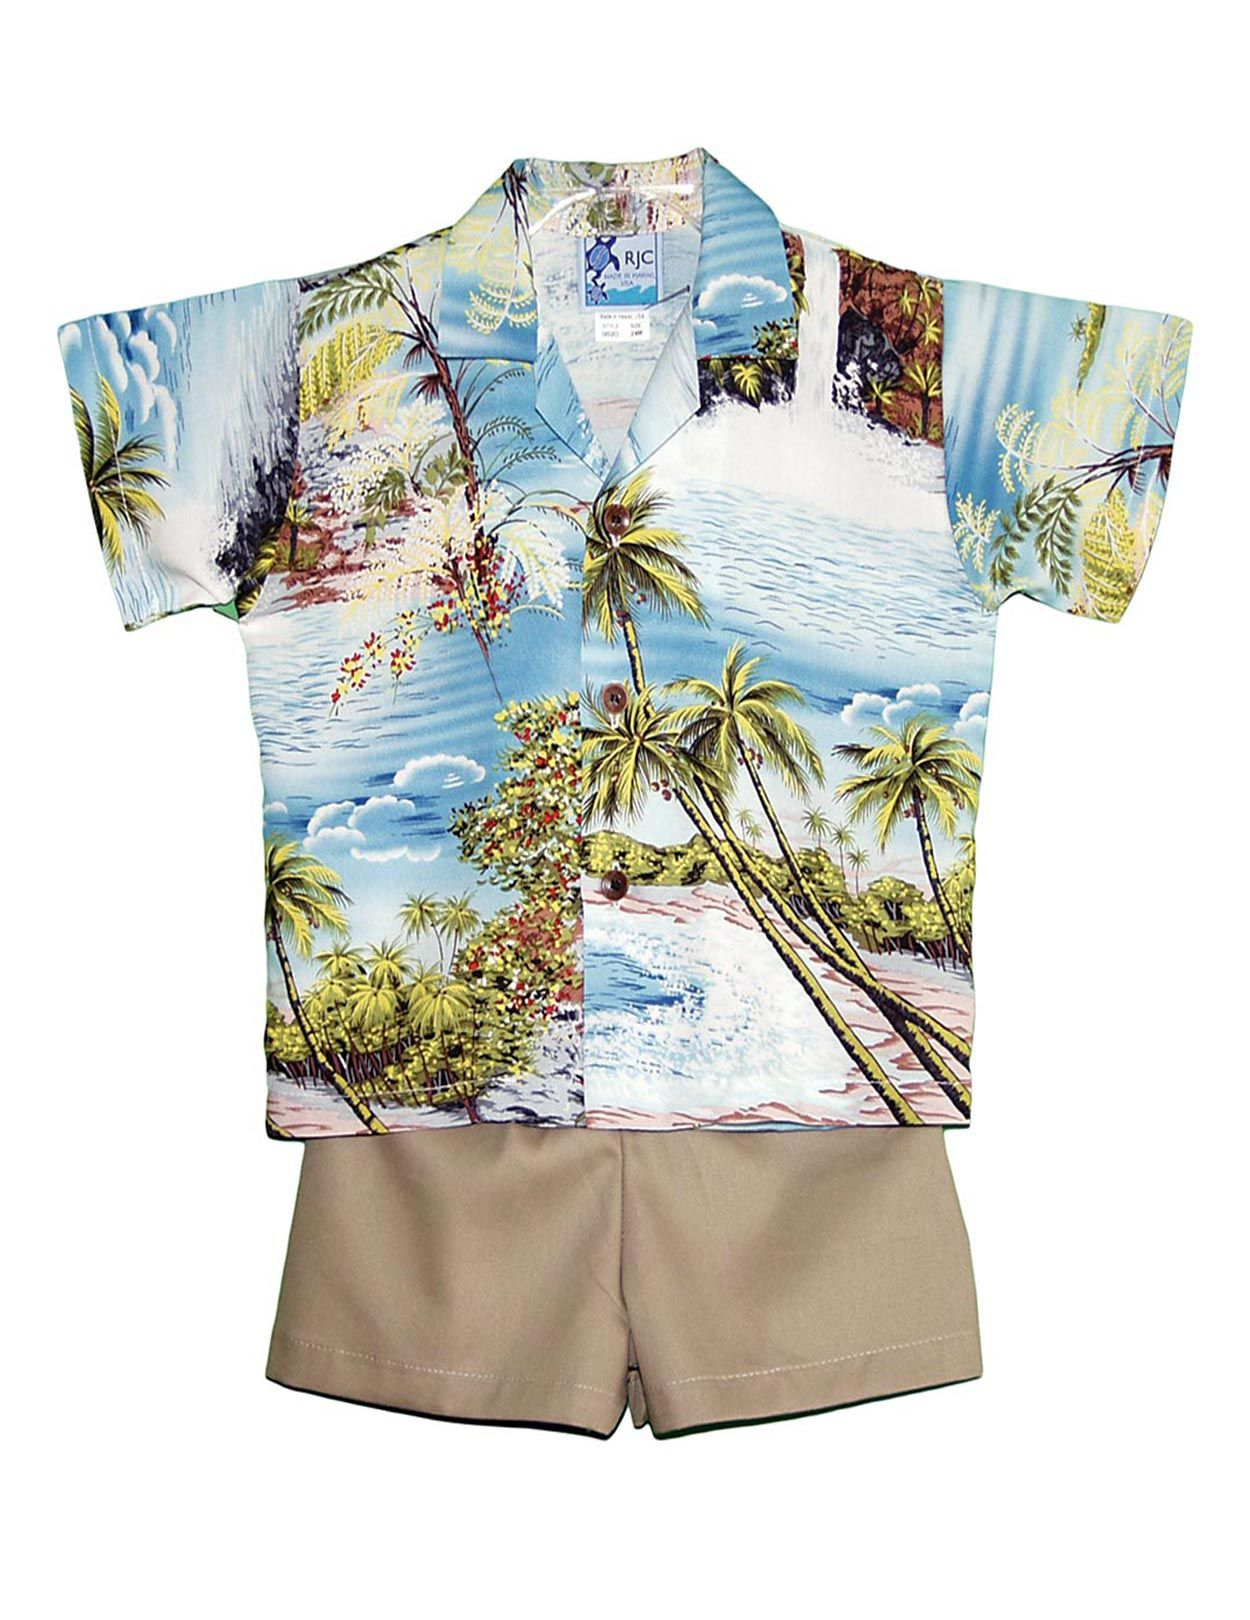 13be4122 Check out the deal on Hana Hou Boy's 2 Piece Hawaiian Rayon Cabana Set at Shaka  Time Hawaii Clothing Store